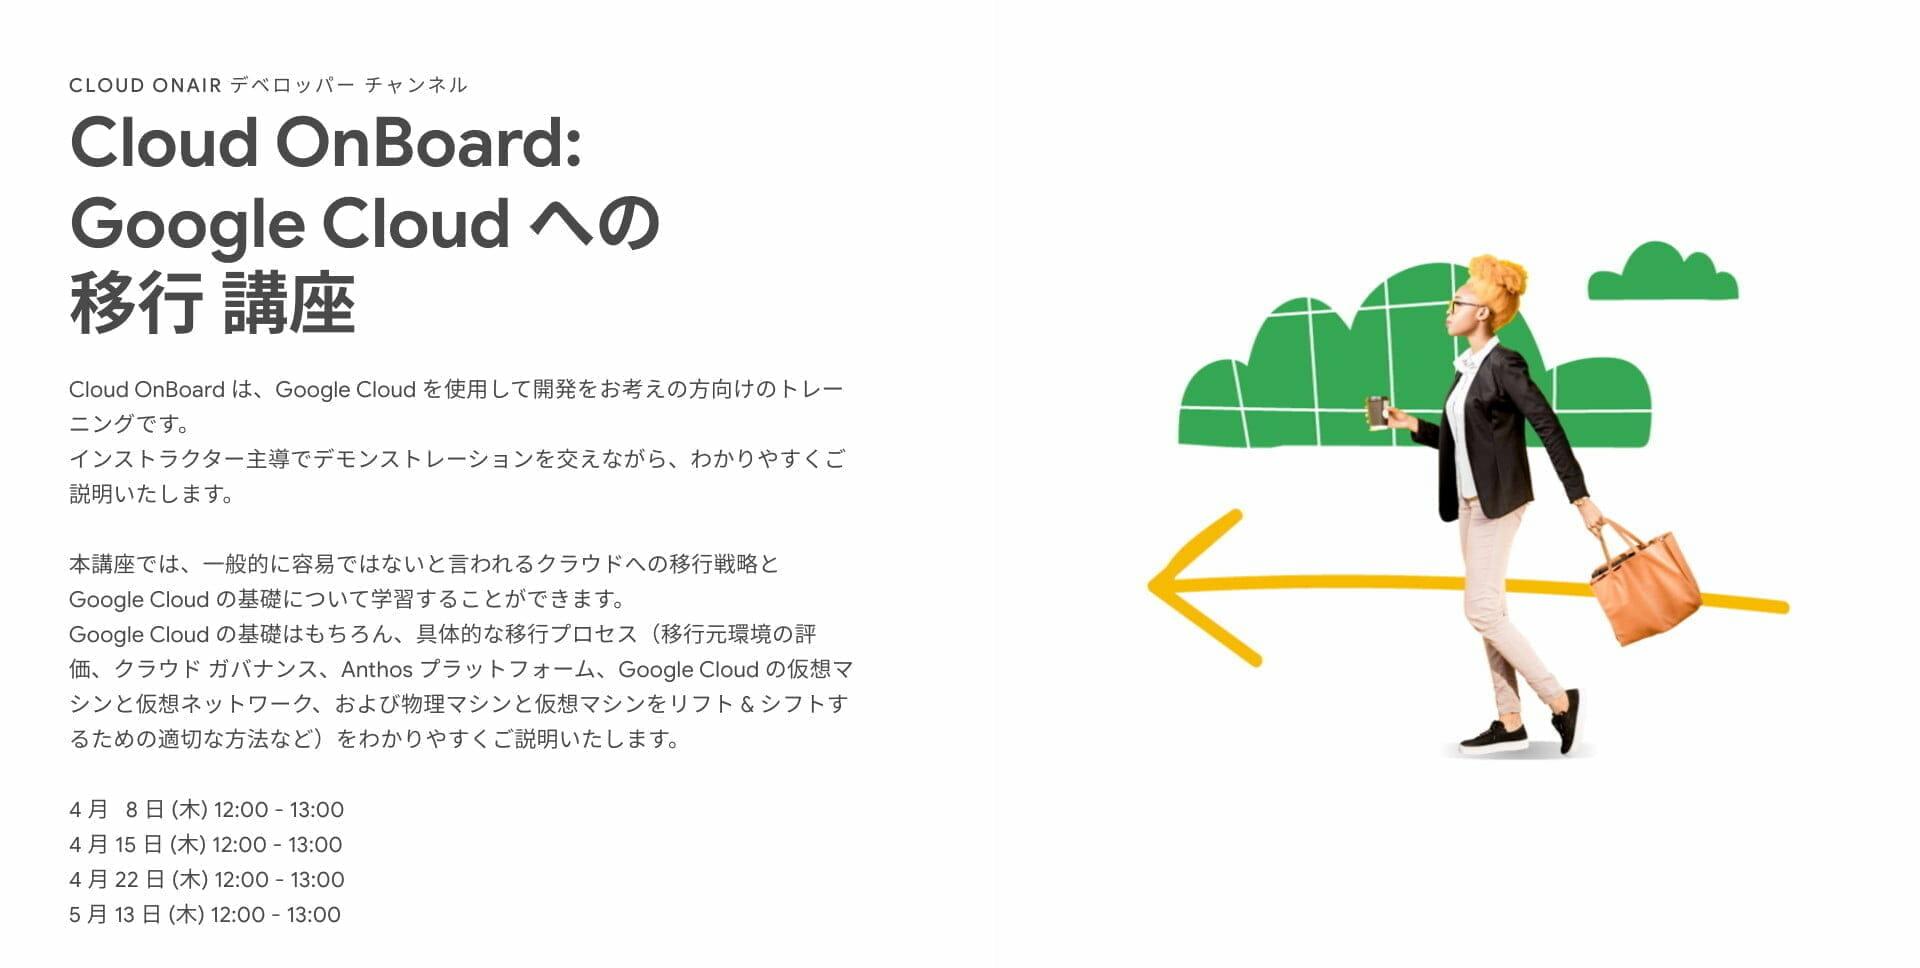 [GCP] Cloud OnBoard: Google Cloud への 移行 講座